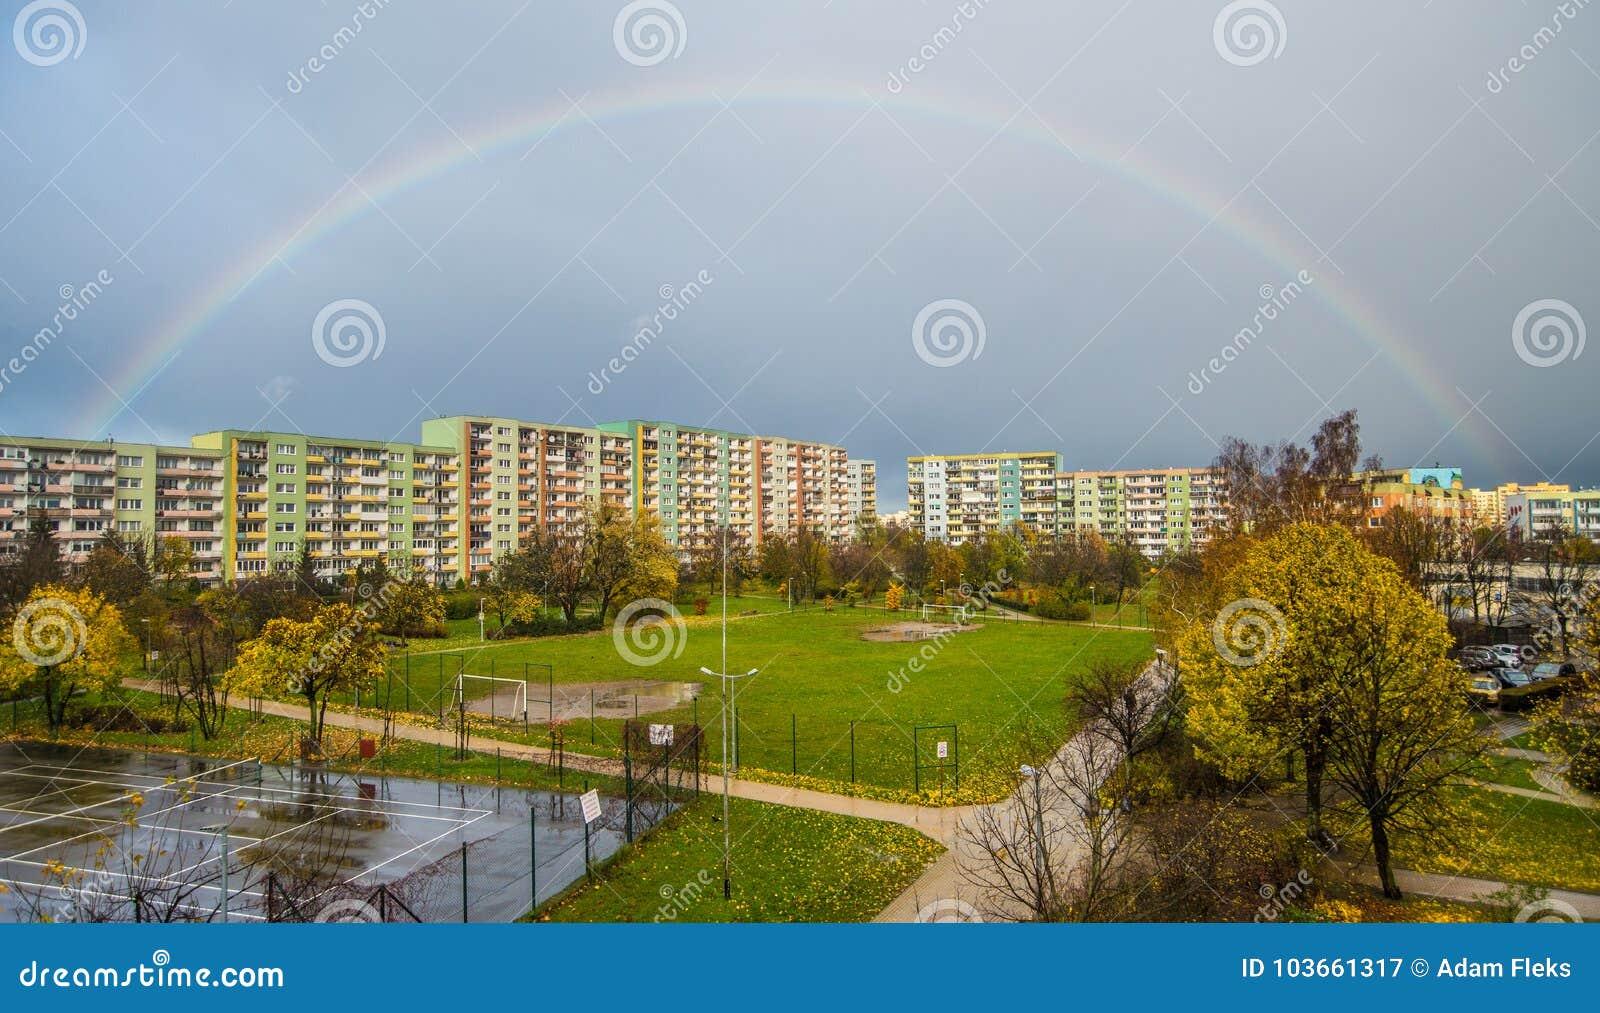 Rainbow Over Blocks Of Flats Editorial Photography - Image ...